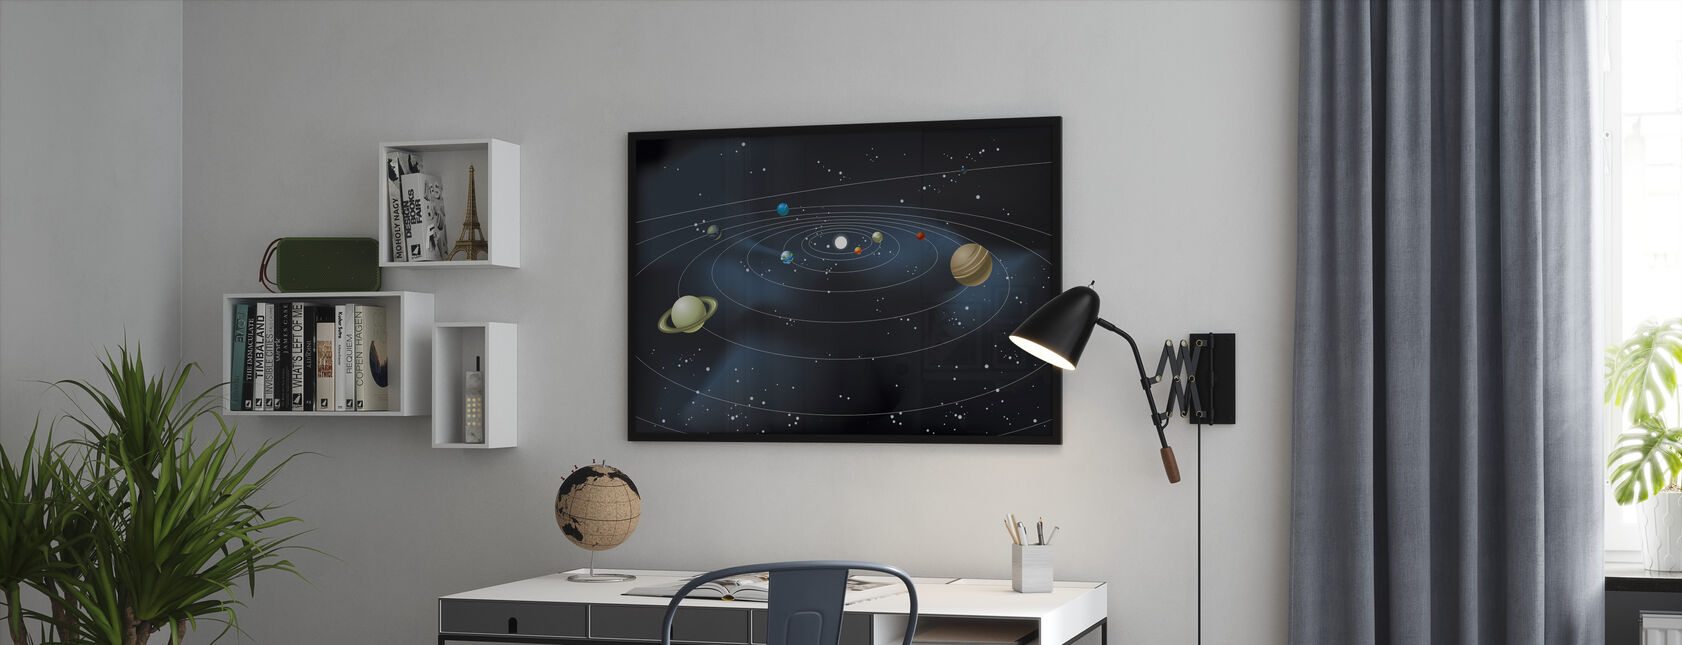 Planetsystem - Inramad tavla - Kontor